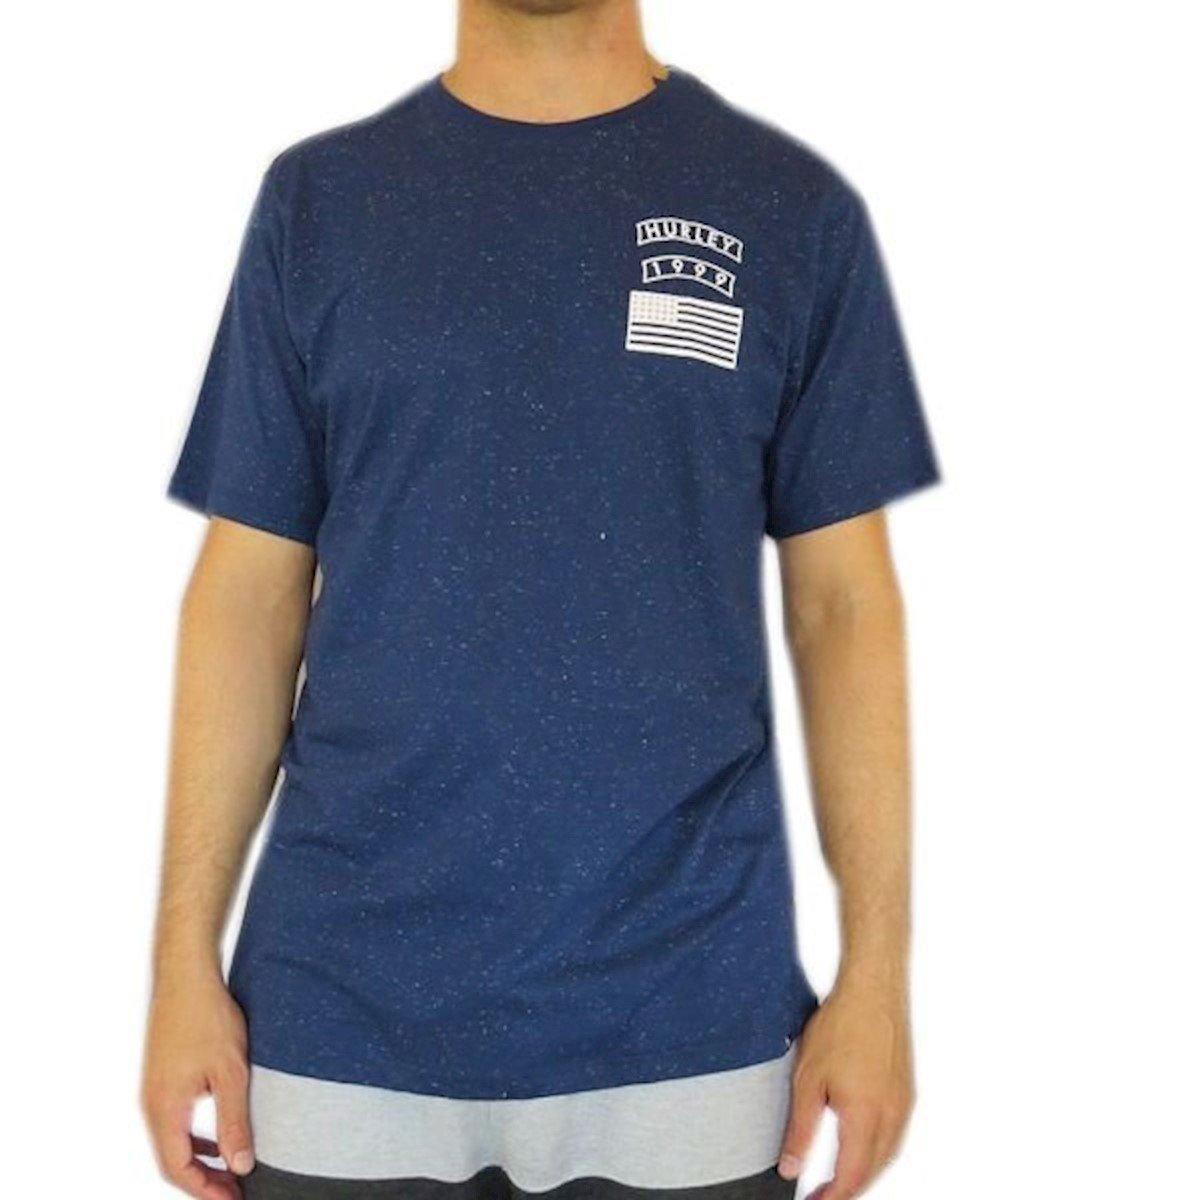 Camiseta Especial Hurley Masculina - Compre Agora  2589abaeaff